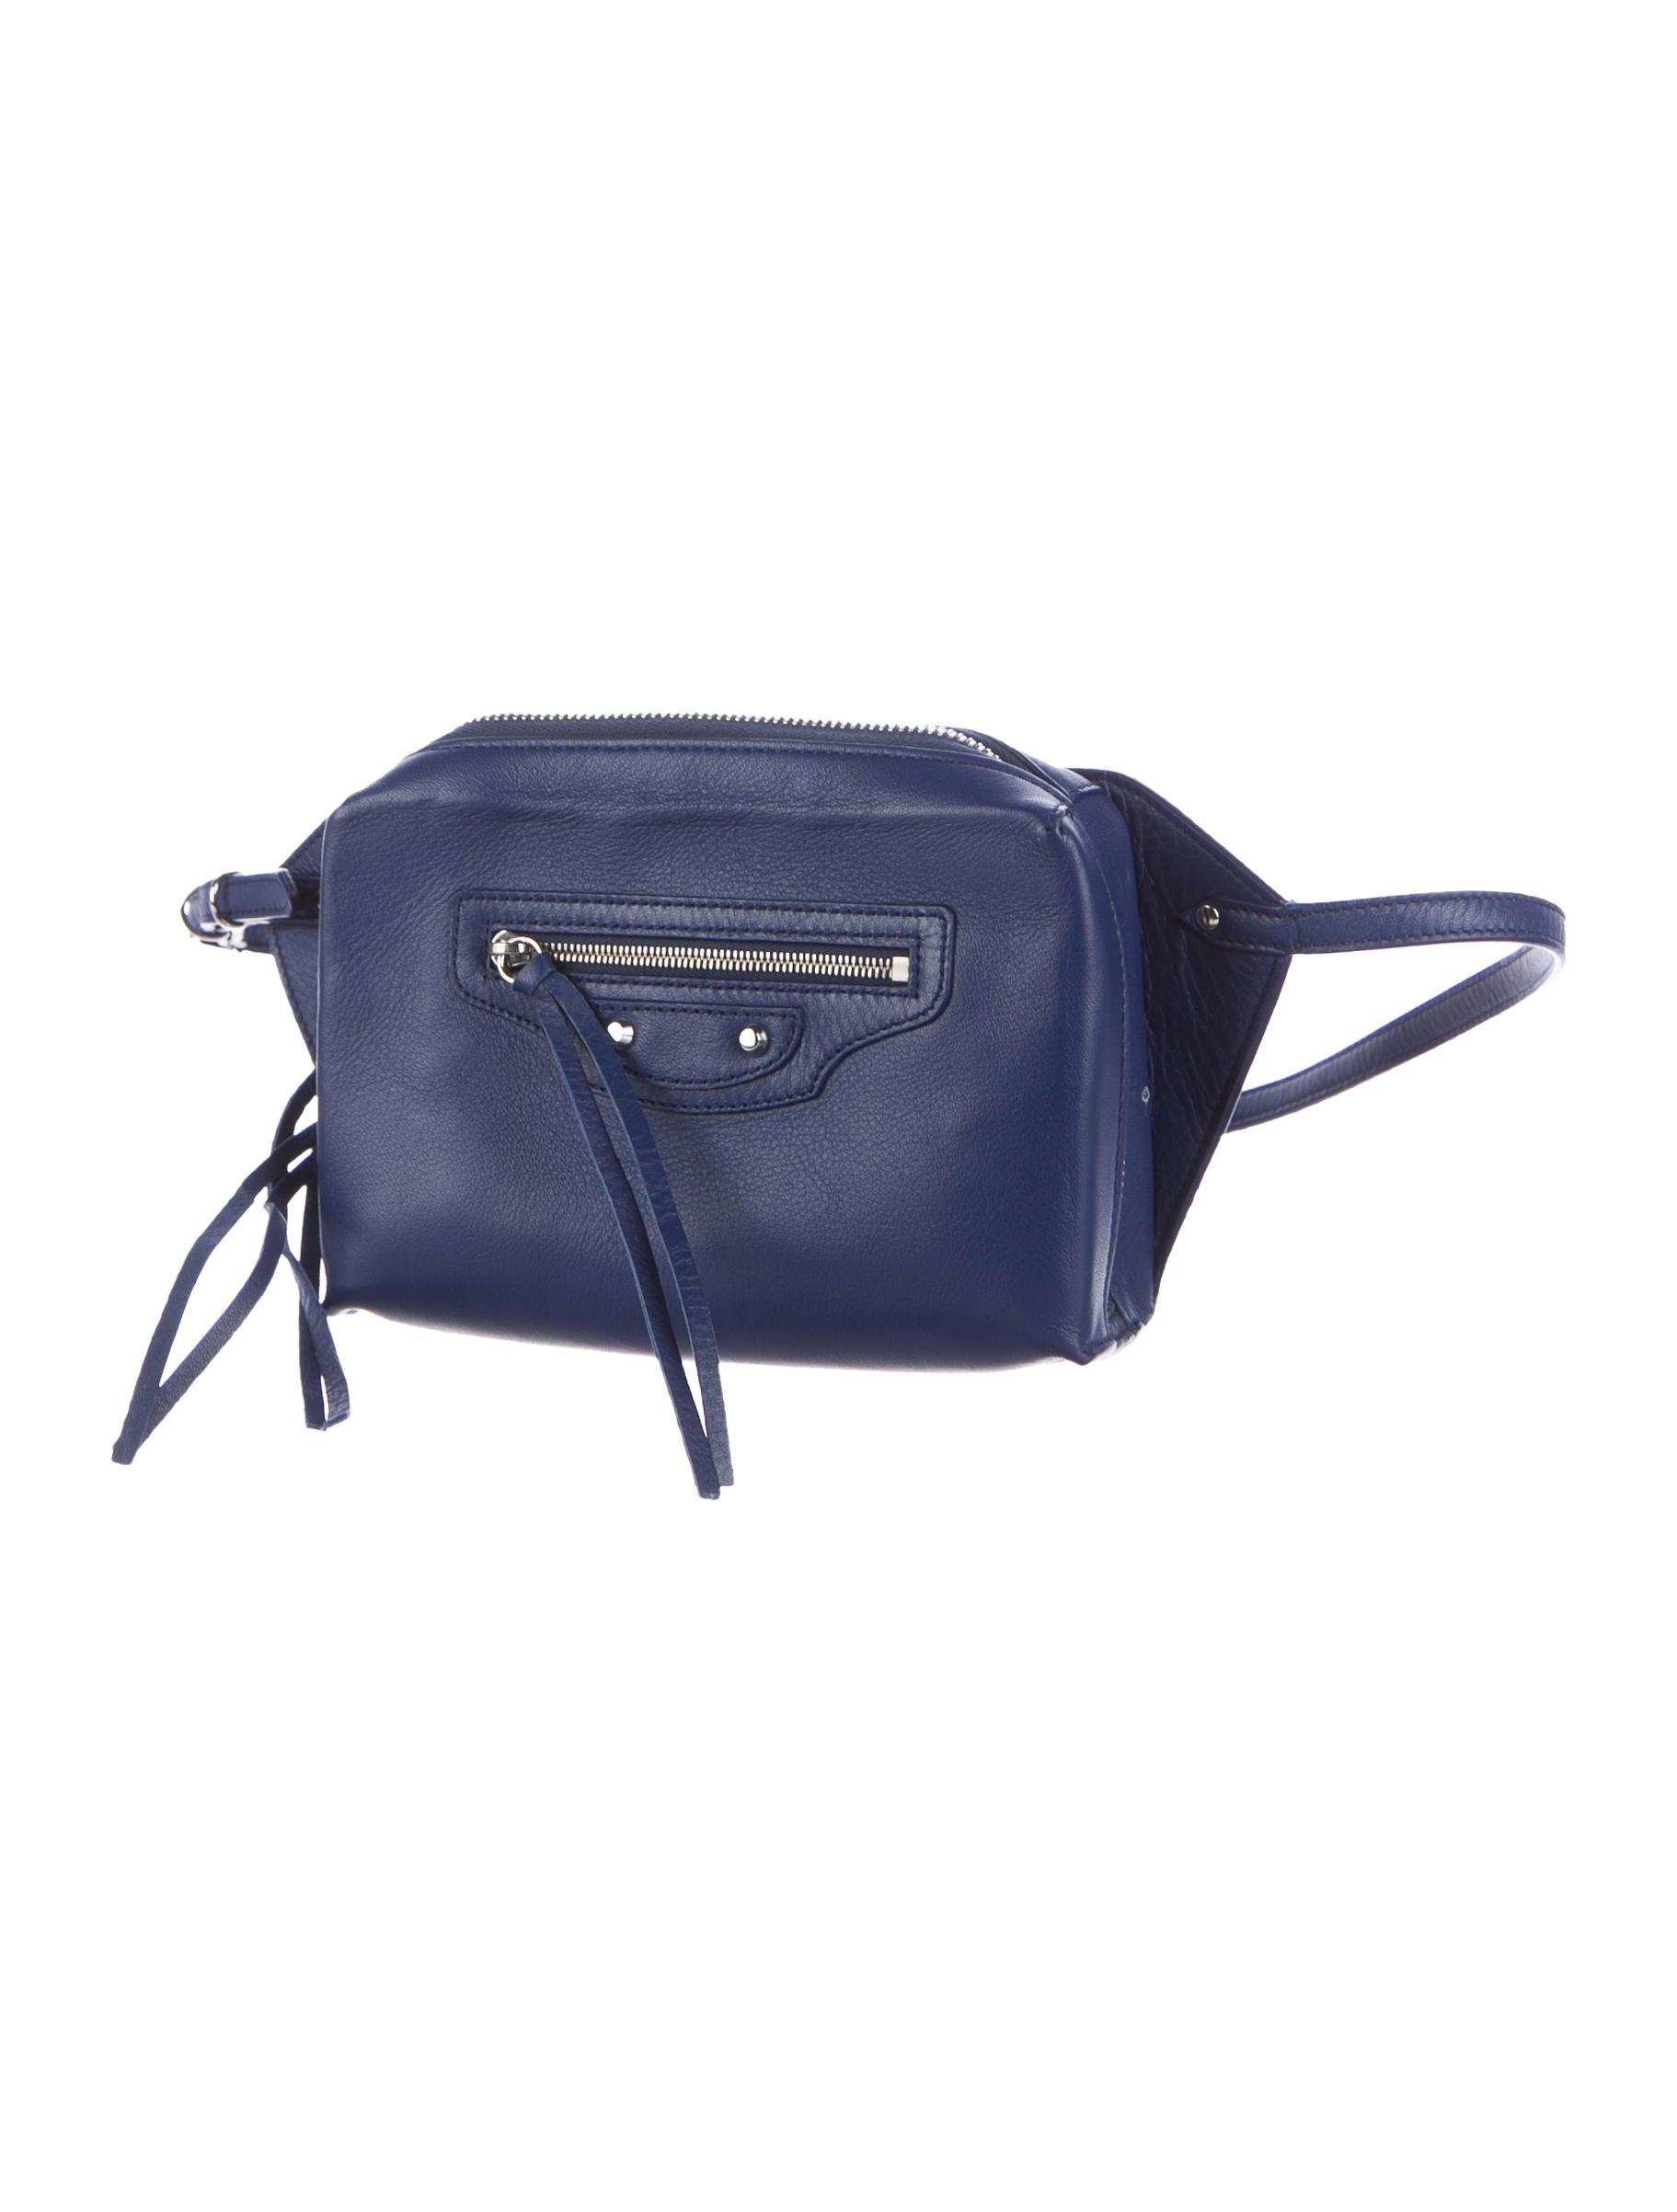 Balenciaga Papier Zip Around Belt Bag